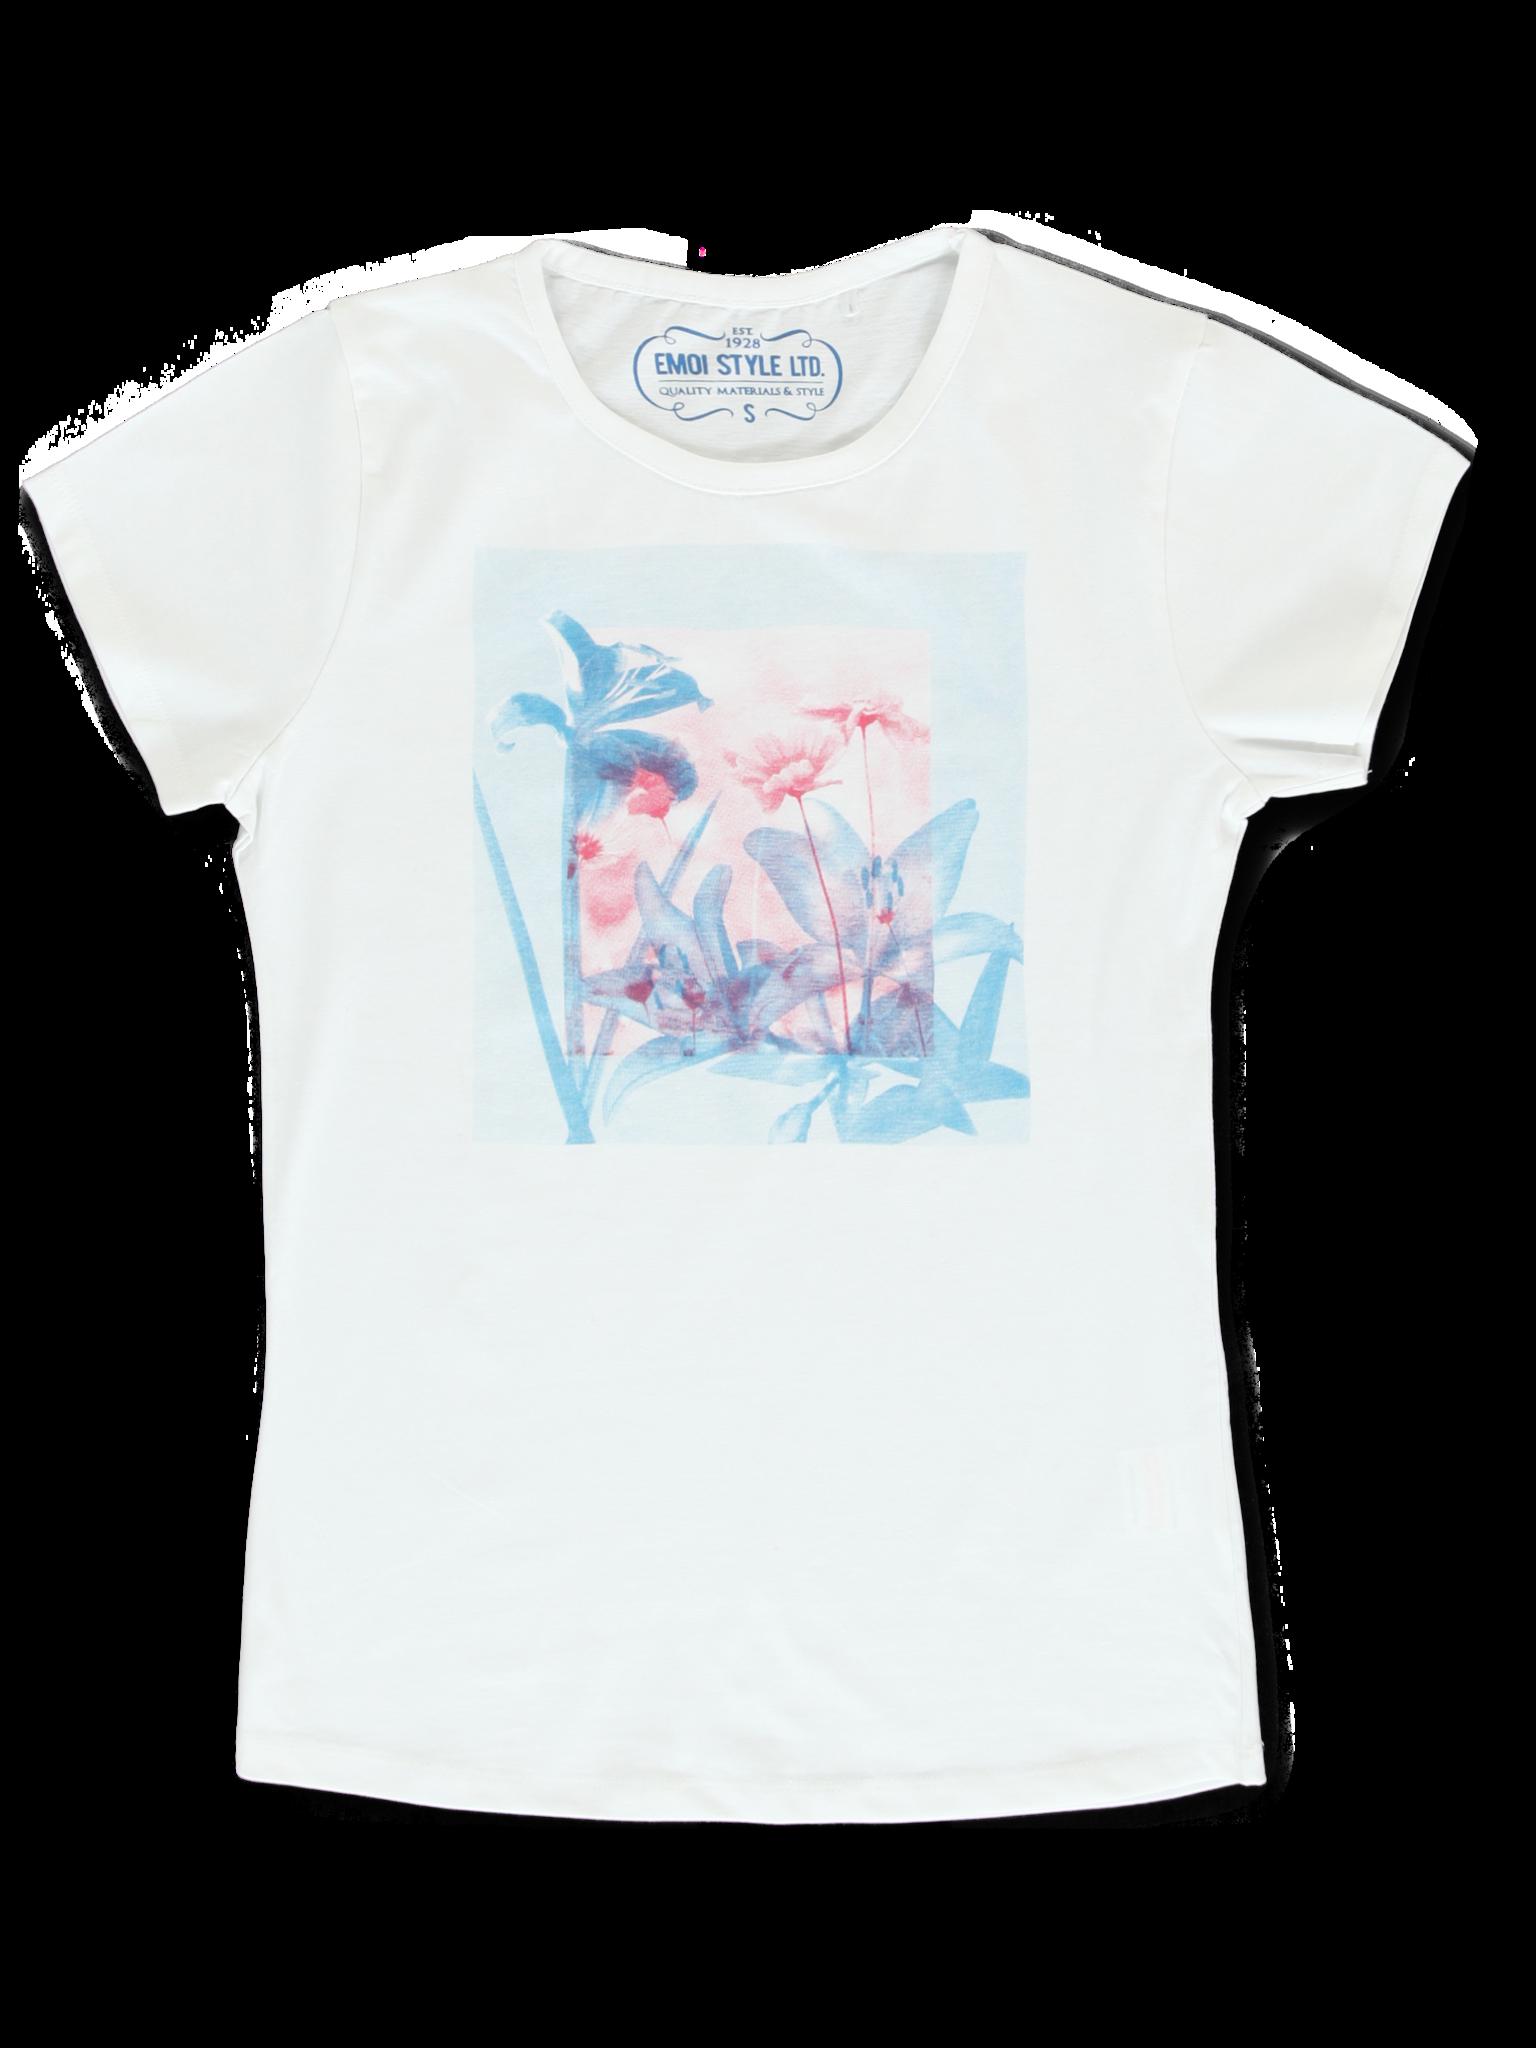 Emoi | Summer 2020 Ladies | T-shirt | 18 pcs/box